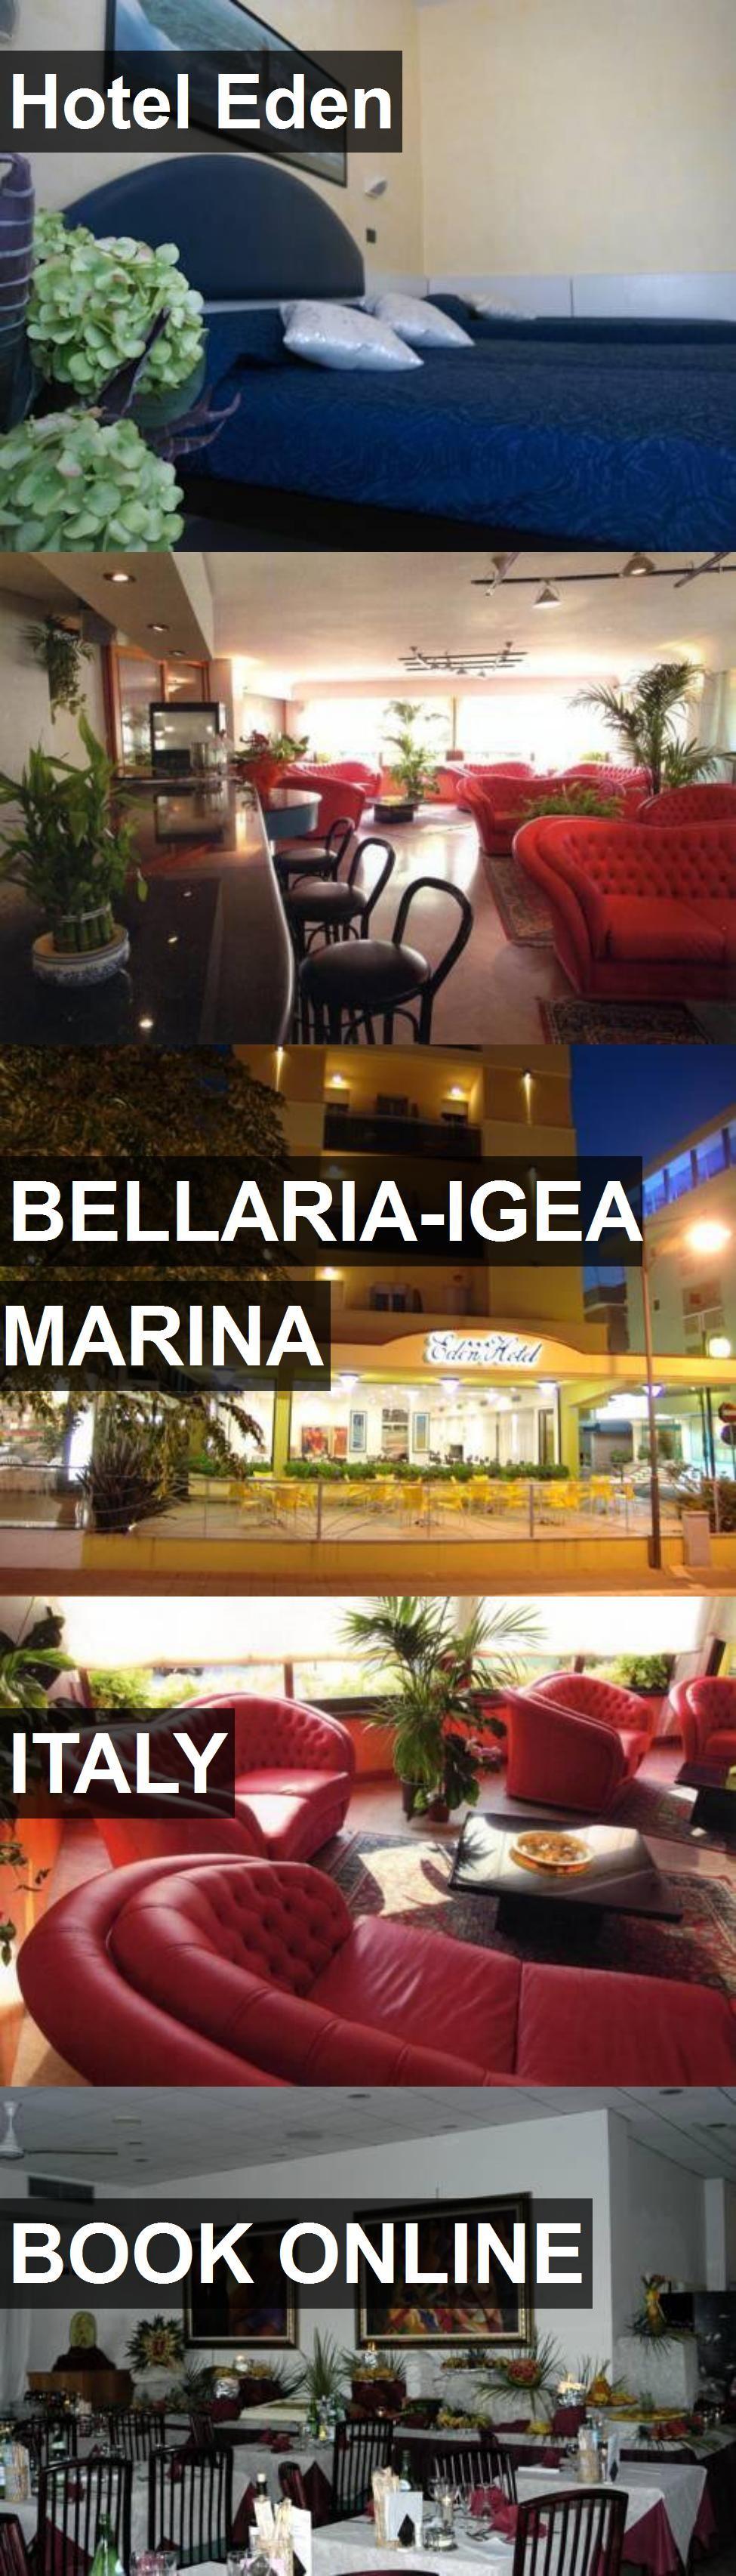 Hotel Eden in BellariaIgea Marina, Italy. For more